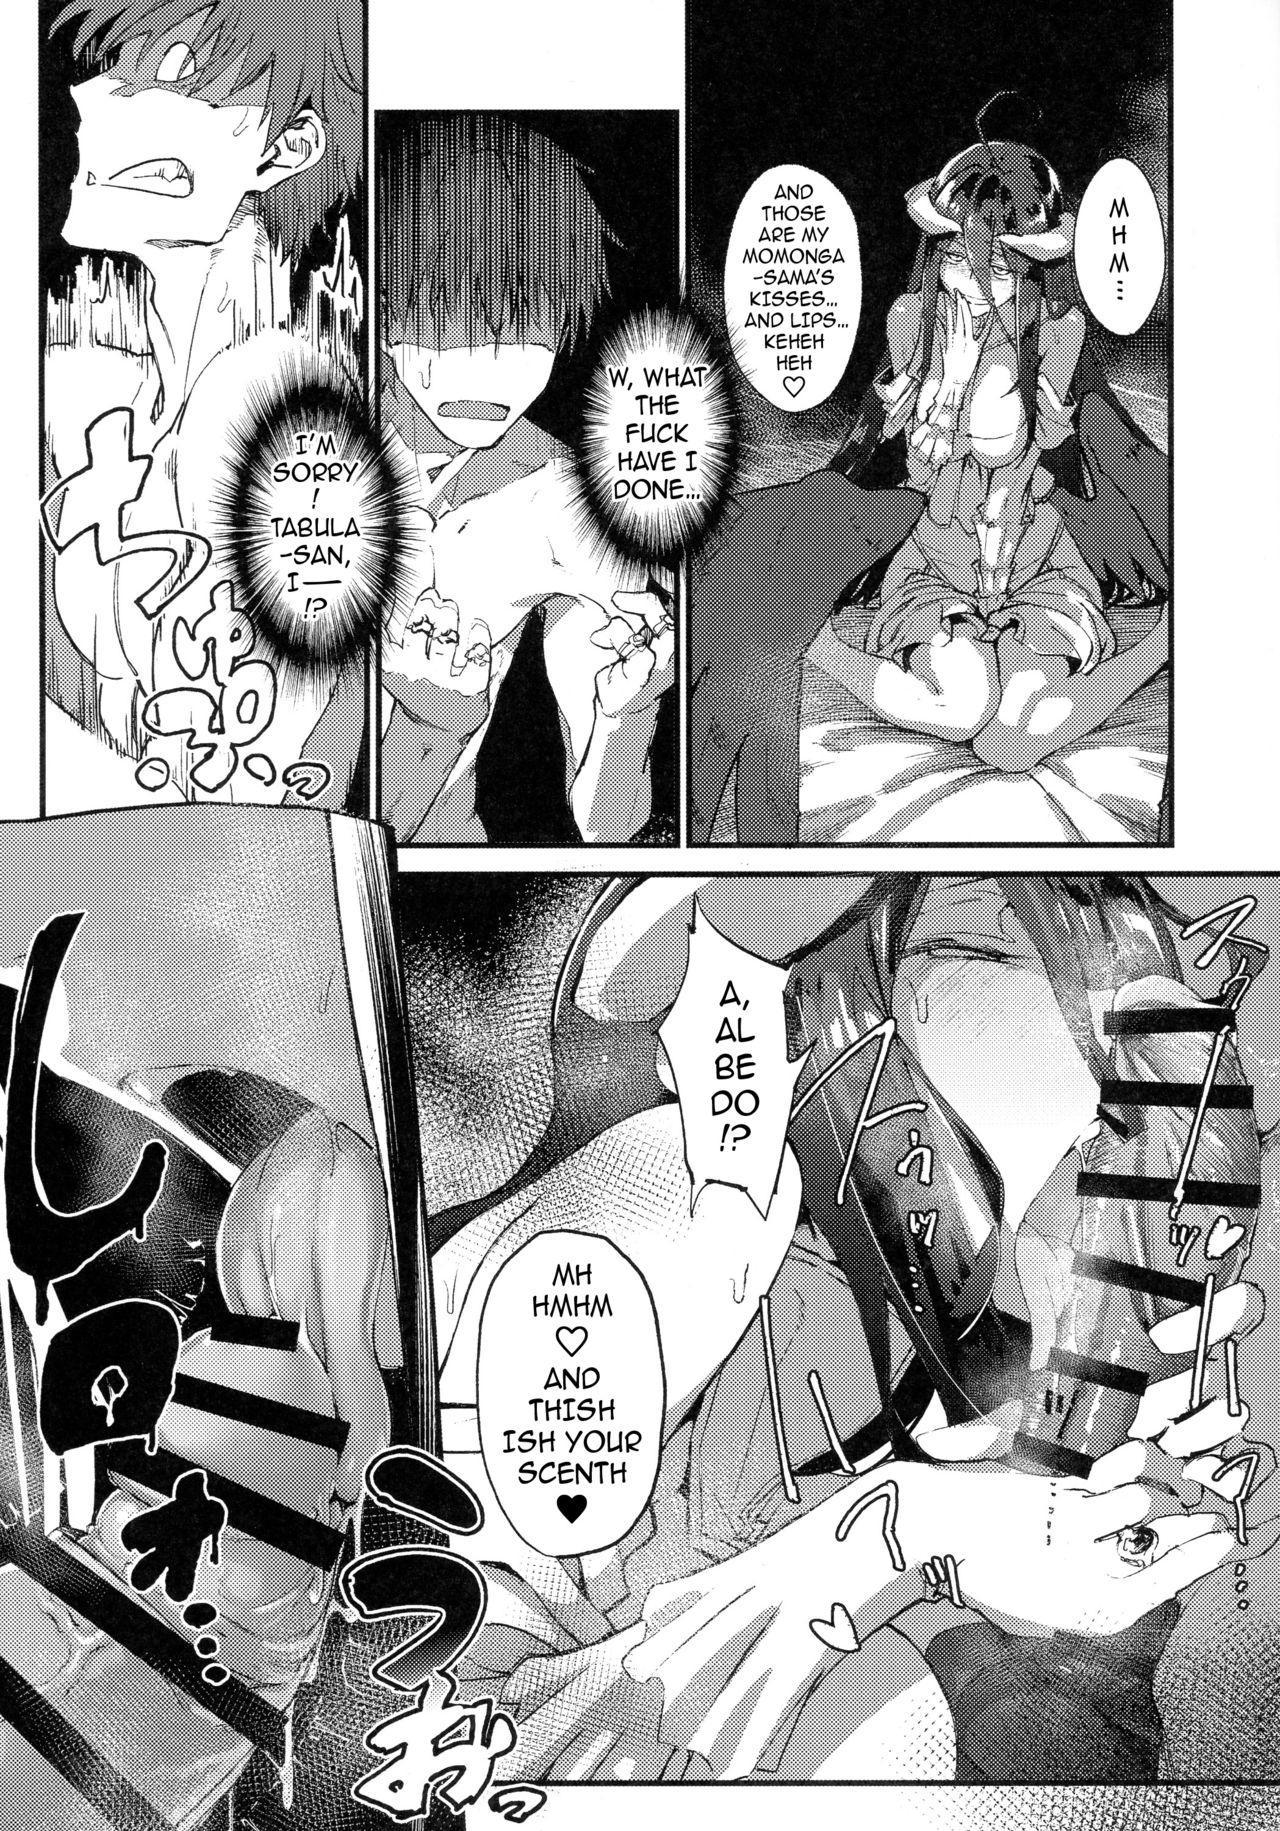 (COMIC1☆13) [Sekigaiken (Komagata)] Ainz-sama no Oyotsugi o! | Ainz-sama, Leave Your Heir to! (Overlord) [English] {darknight} 15